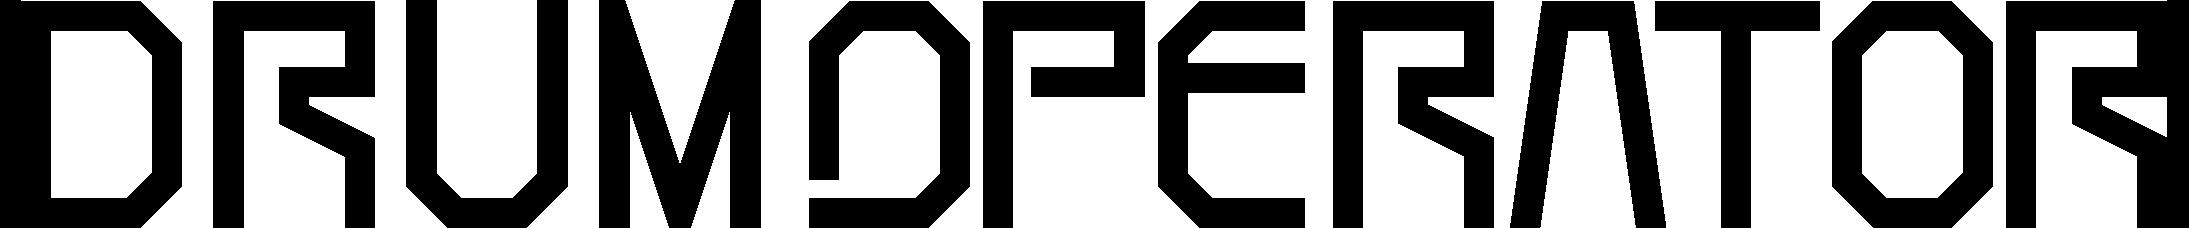 drum operator logo.png